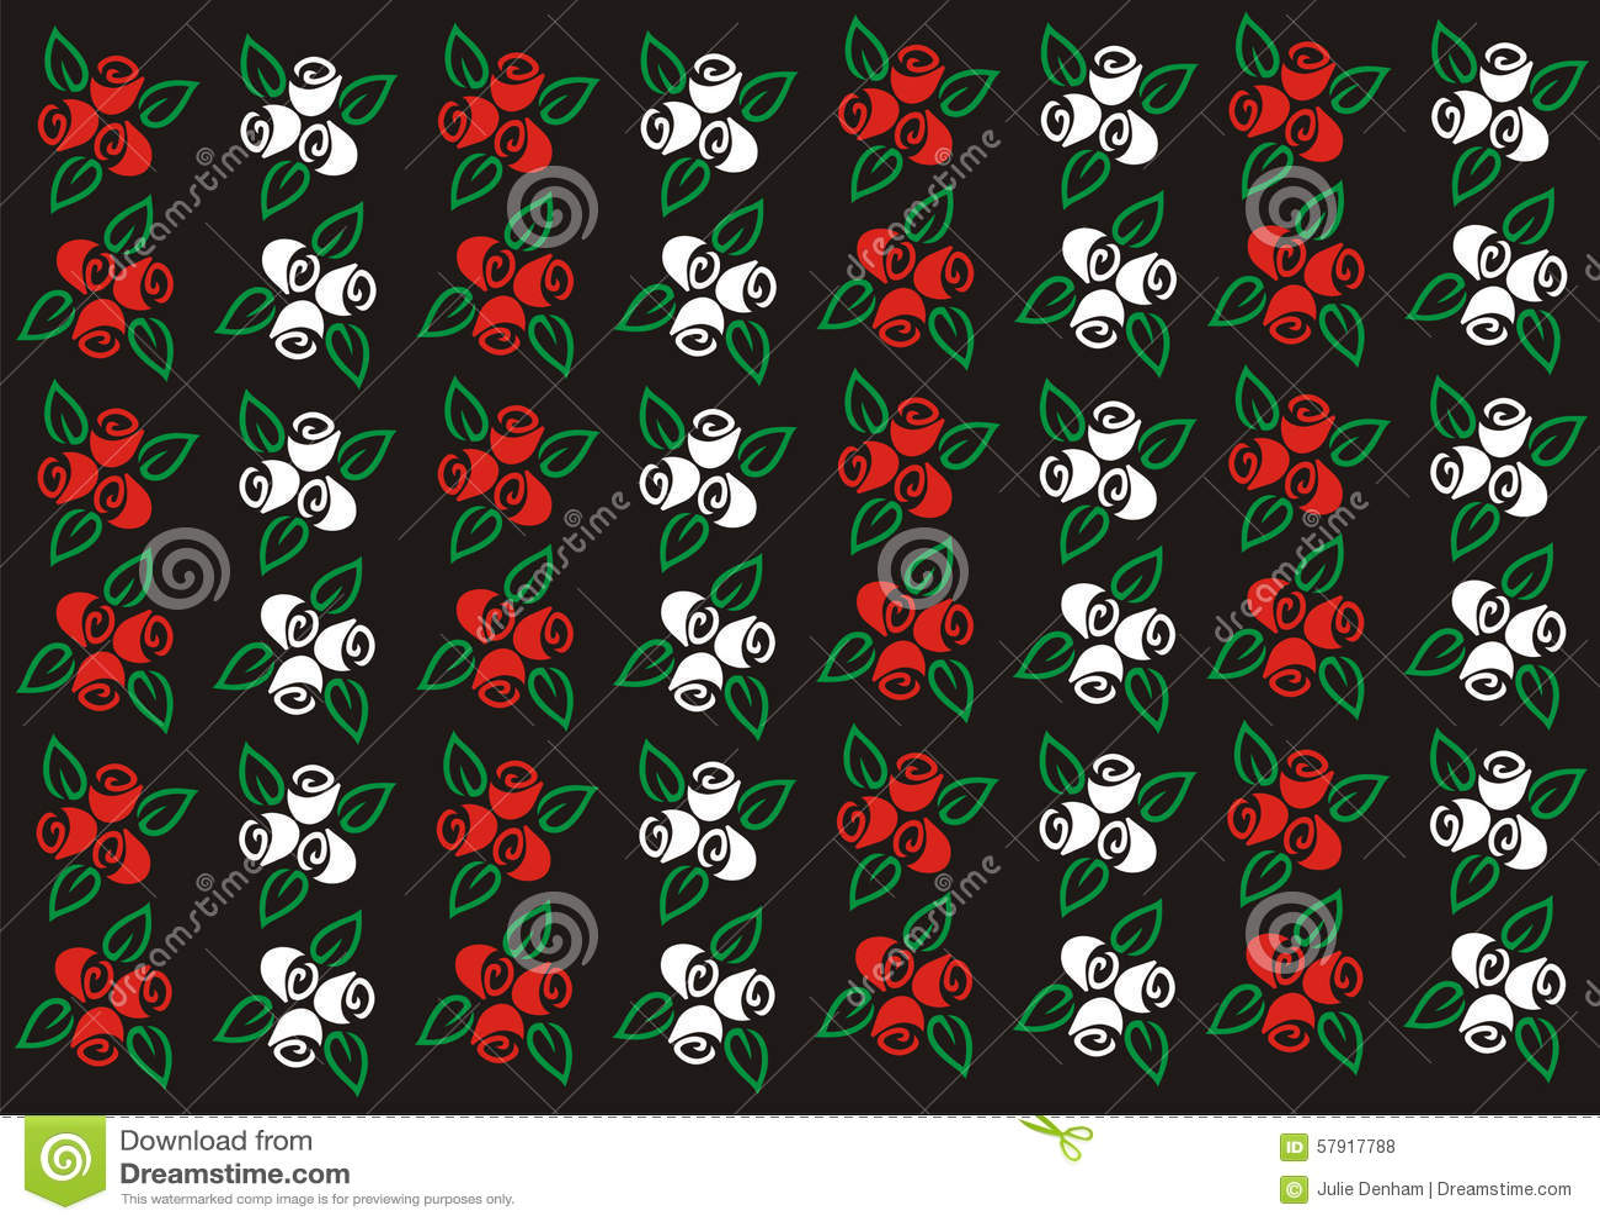 Roses Flowers Wallpaper Background Stock Photo Image Of Flower